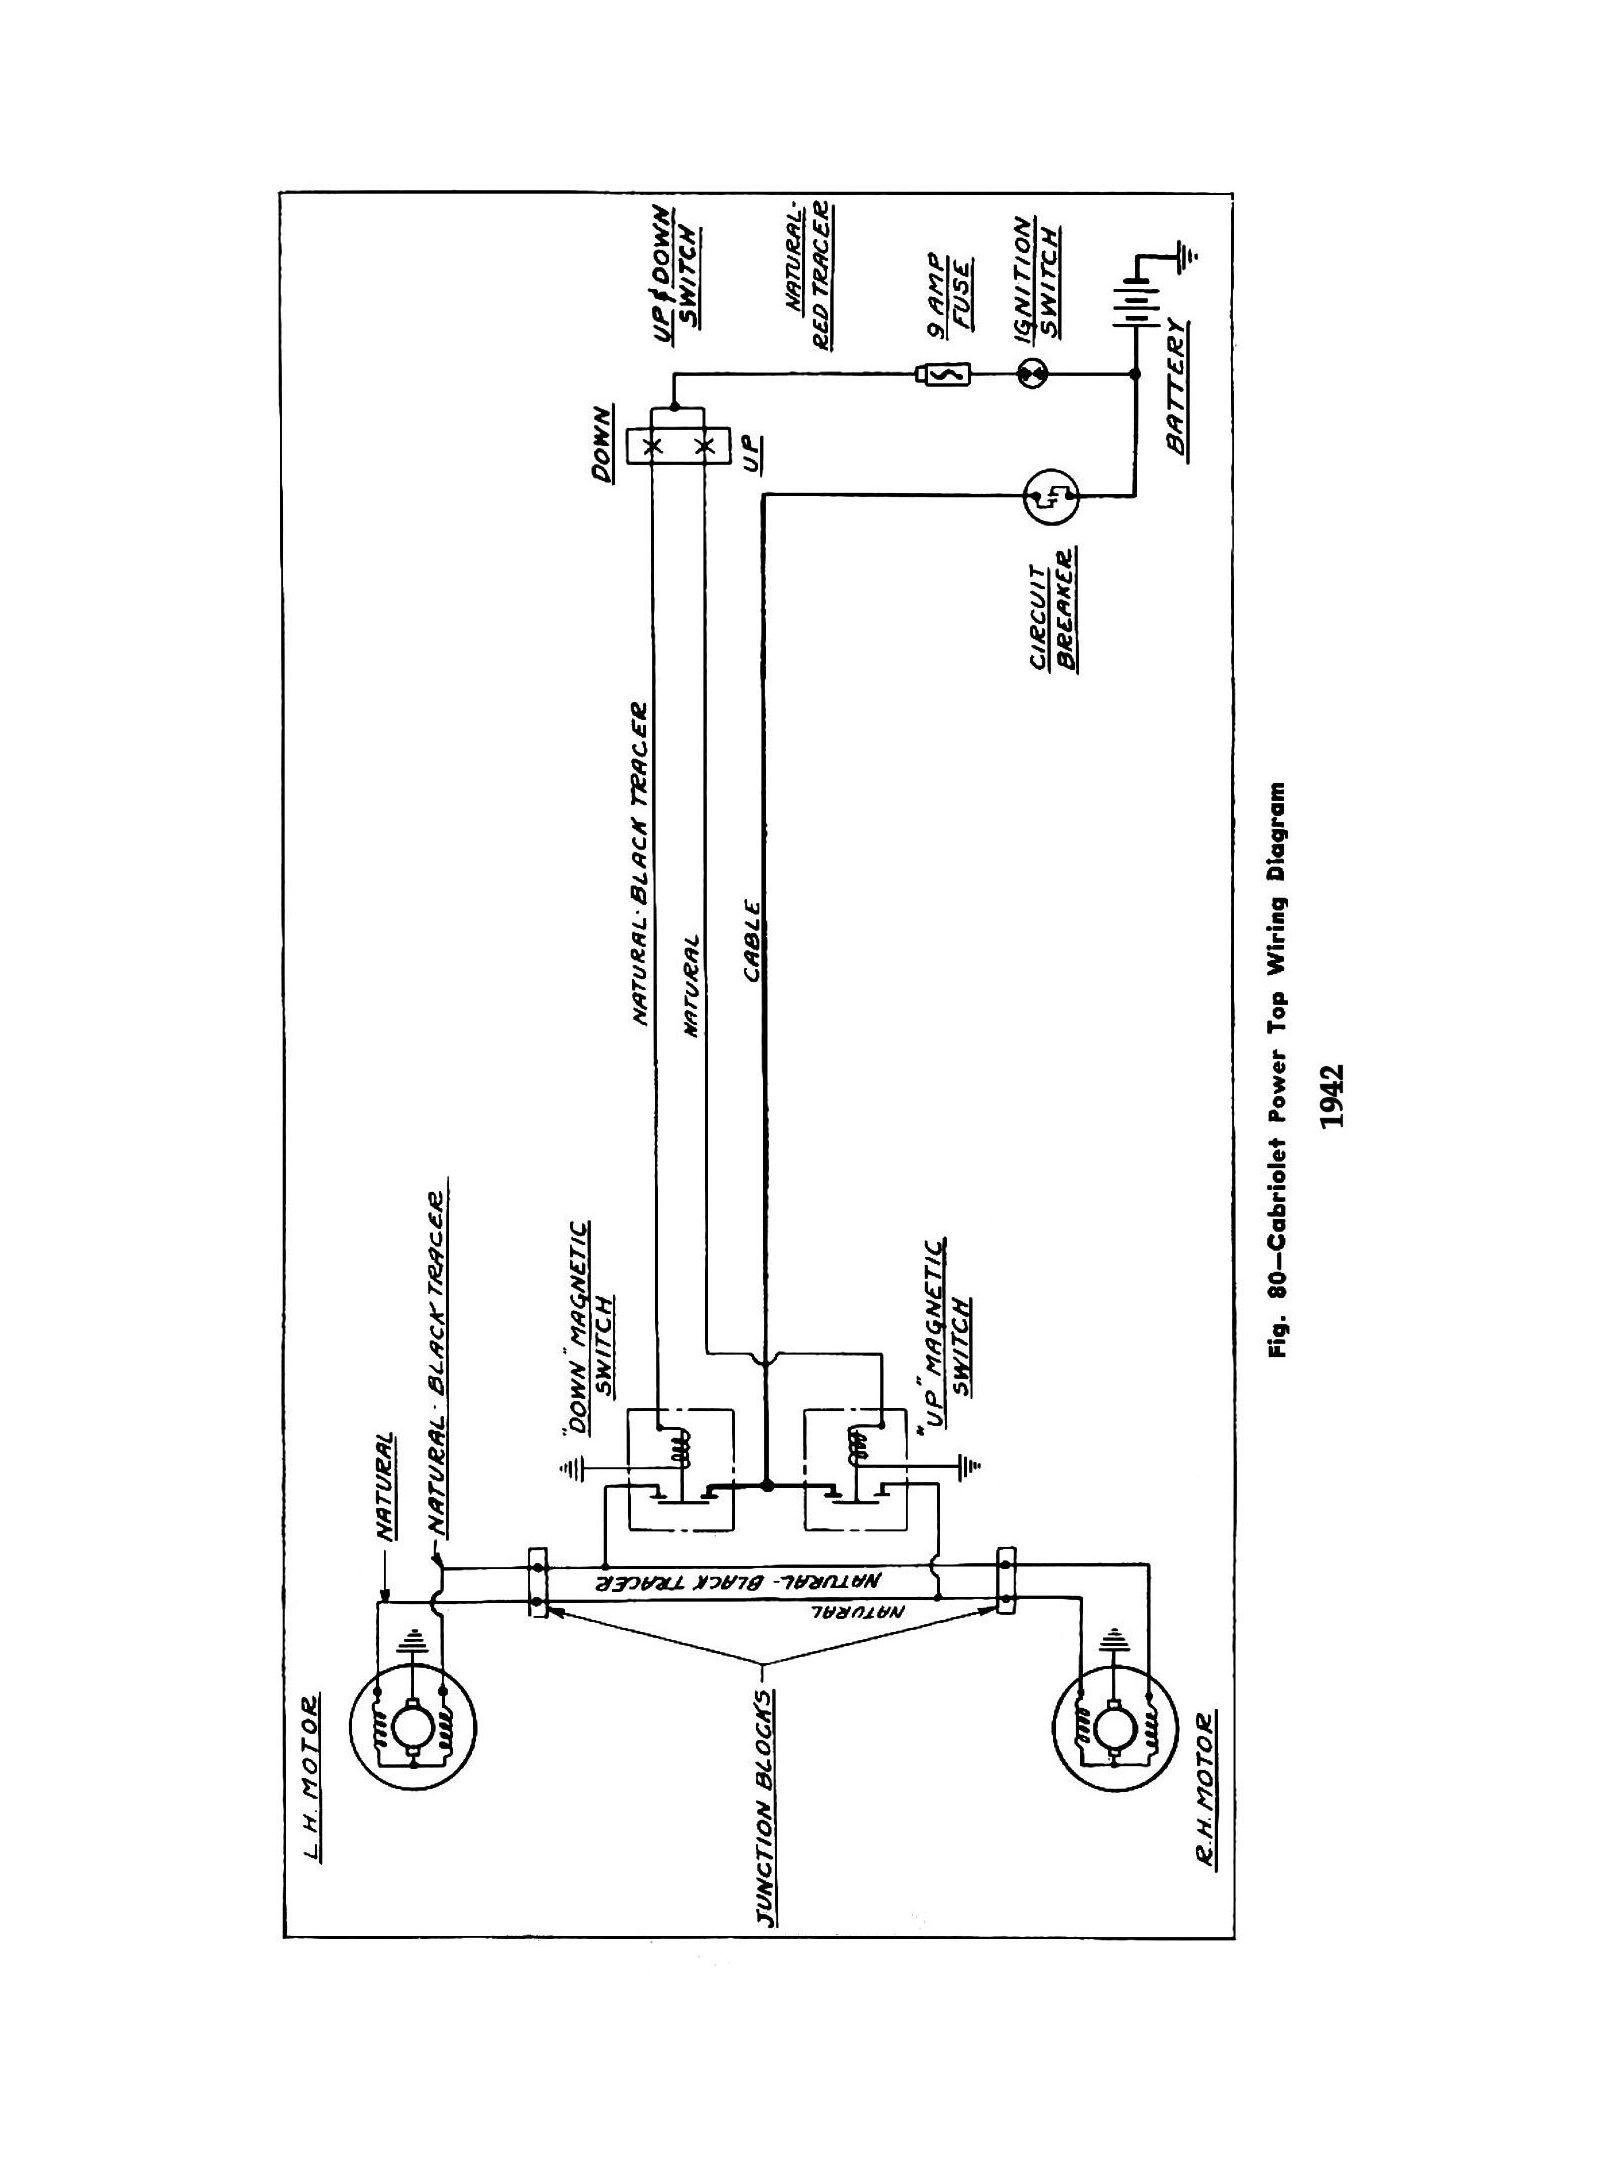 toyota tundra trailer wiring harness diagram - toyota tundra trailer wiring  harness diagram unique chevy wiring